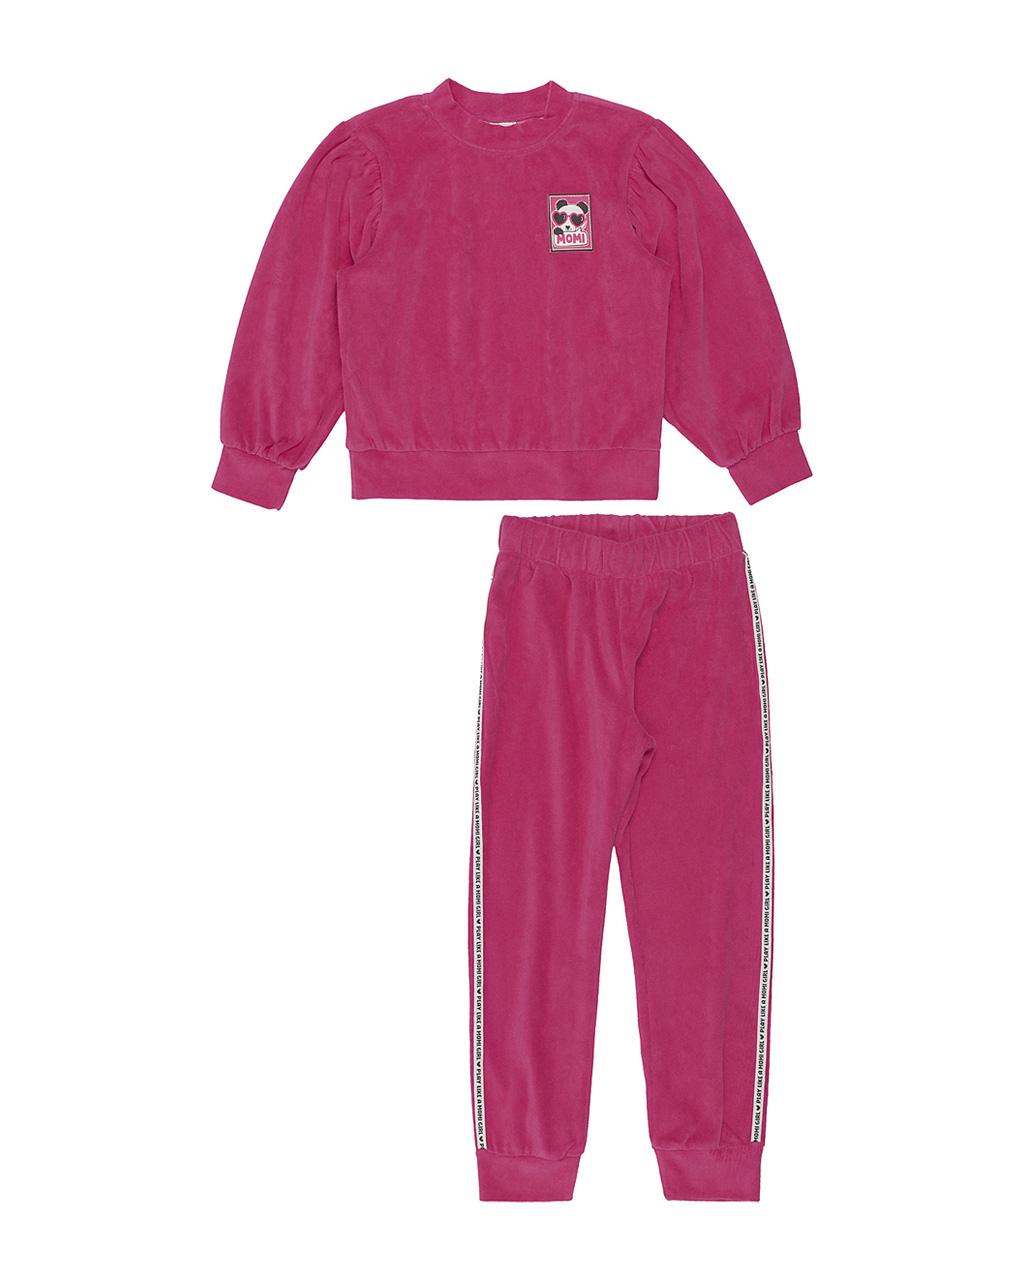 Conjunto Infantil Blusa Moletinho Plush Rosa E Calça Plush Detalhe Lateral Momi